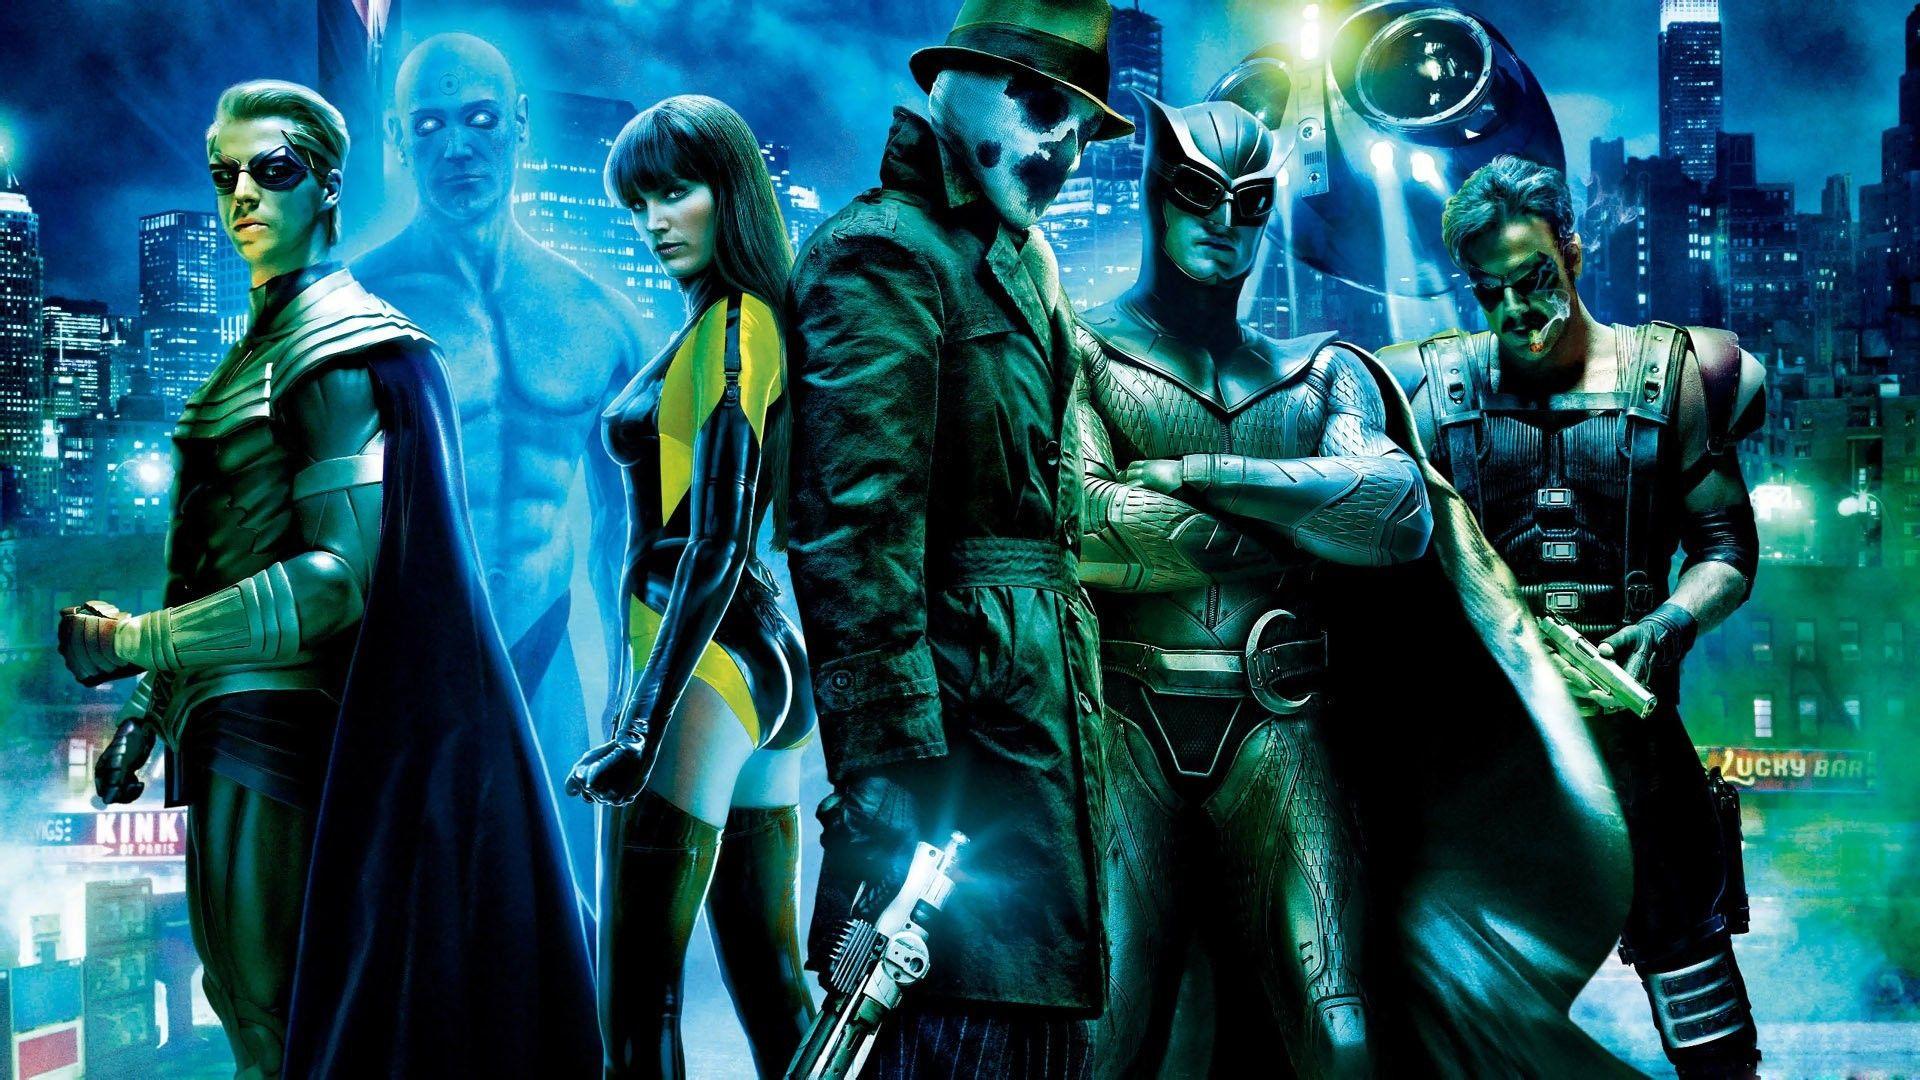 1080p Movie Wallpapers Live Action Filmes Filme Watchmen